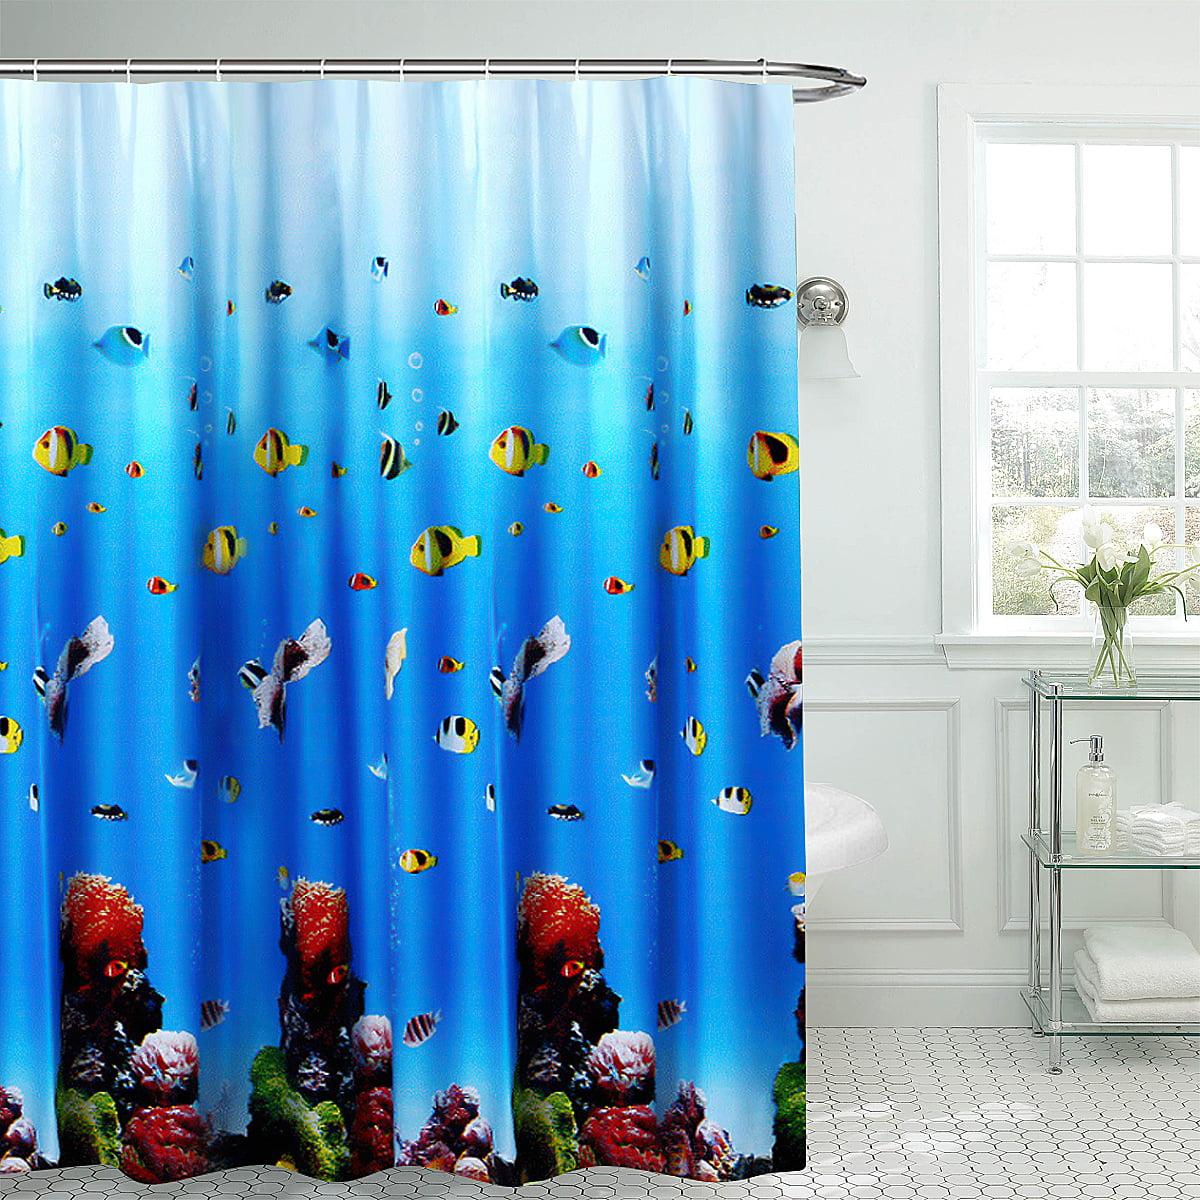 Tropical Ocean Underwater World Colorful Fish Waterproof Shower Curtain Window Curtain Non Slip Mats Bath Carpets Toilet Seat Cover Floor Mat Bathroom Decor Walmart Com Walmart Com